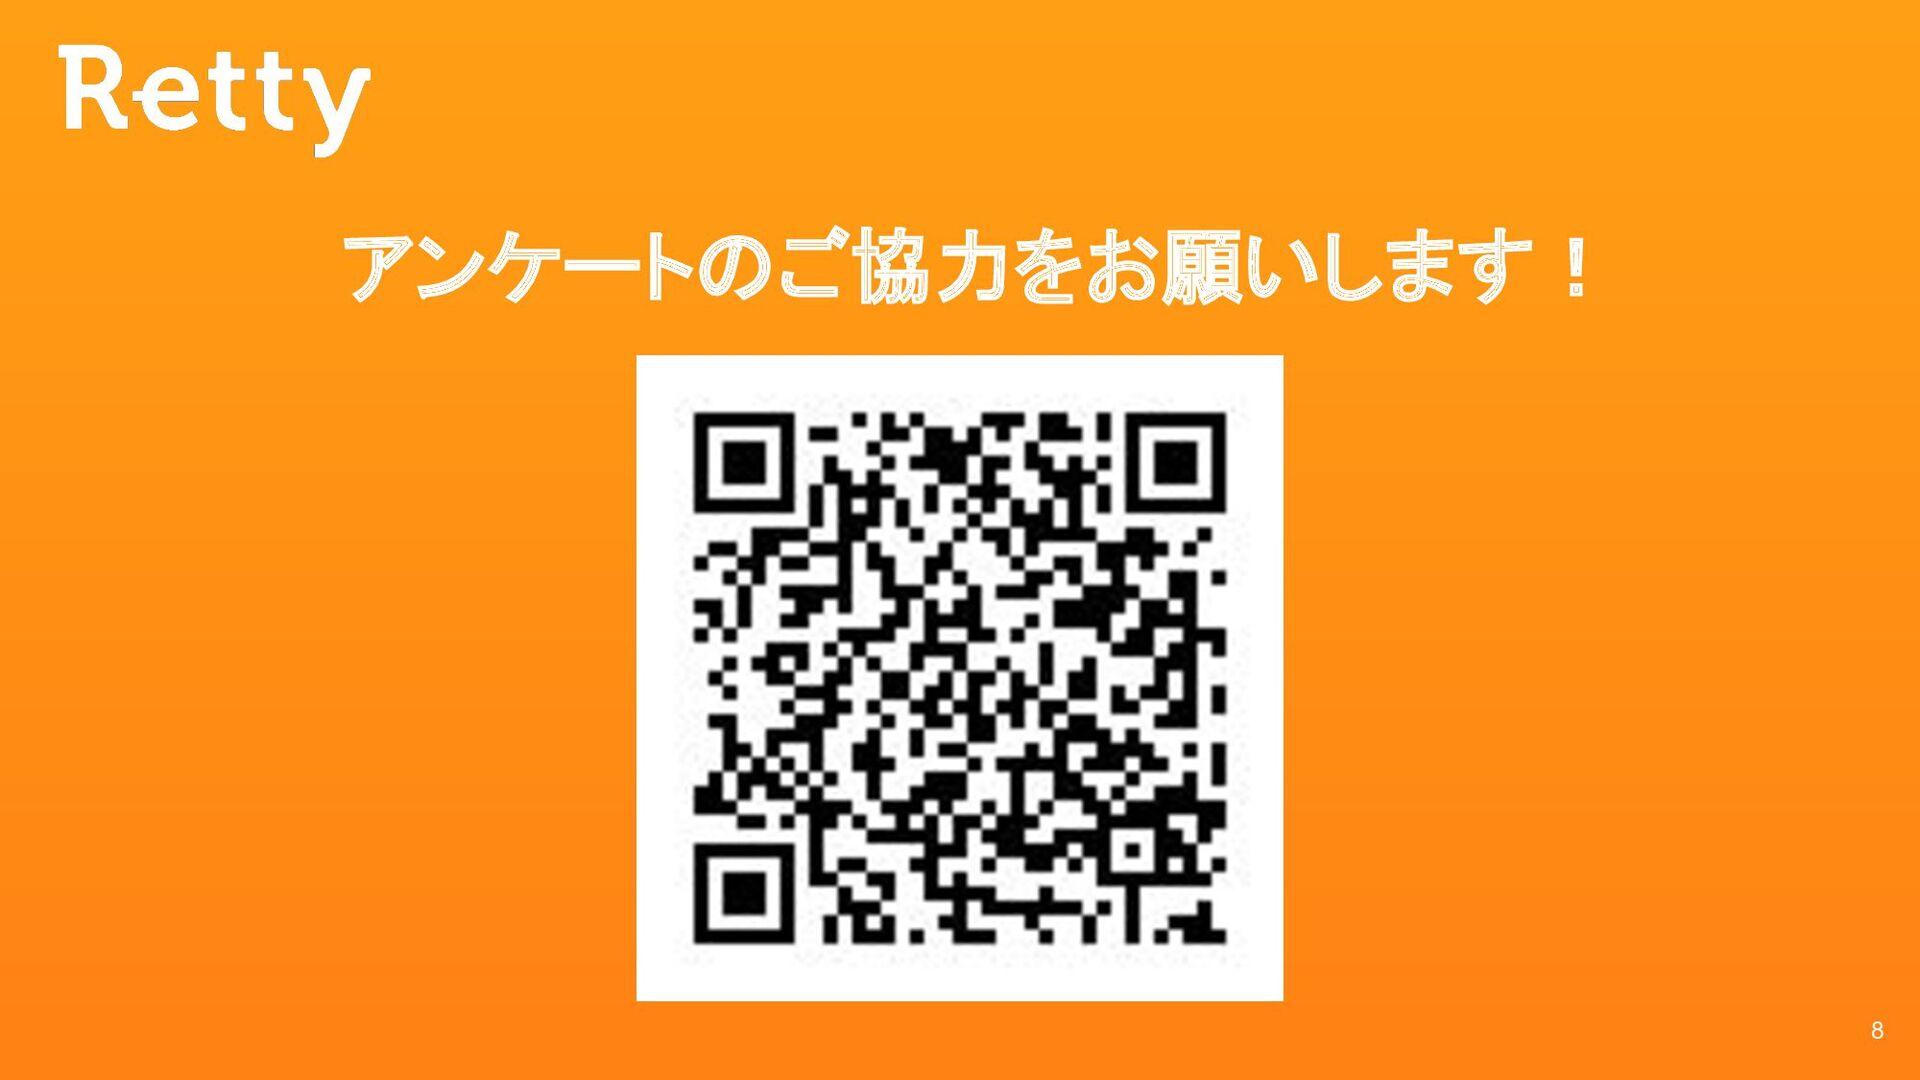 Vision 8 食を通じて 世界中の人々を Happyに。 世界に誇る日本の文化であり、世界...